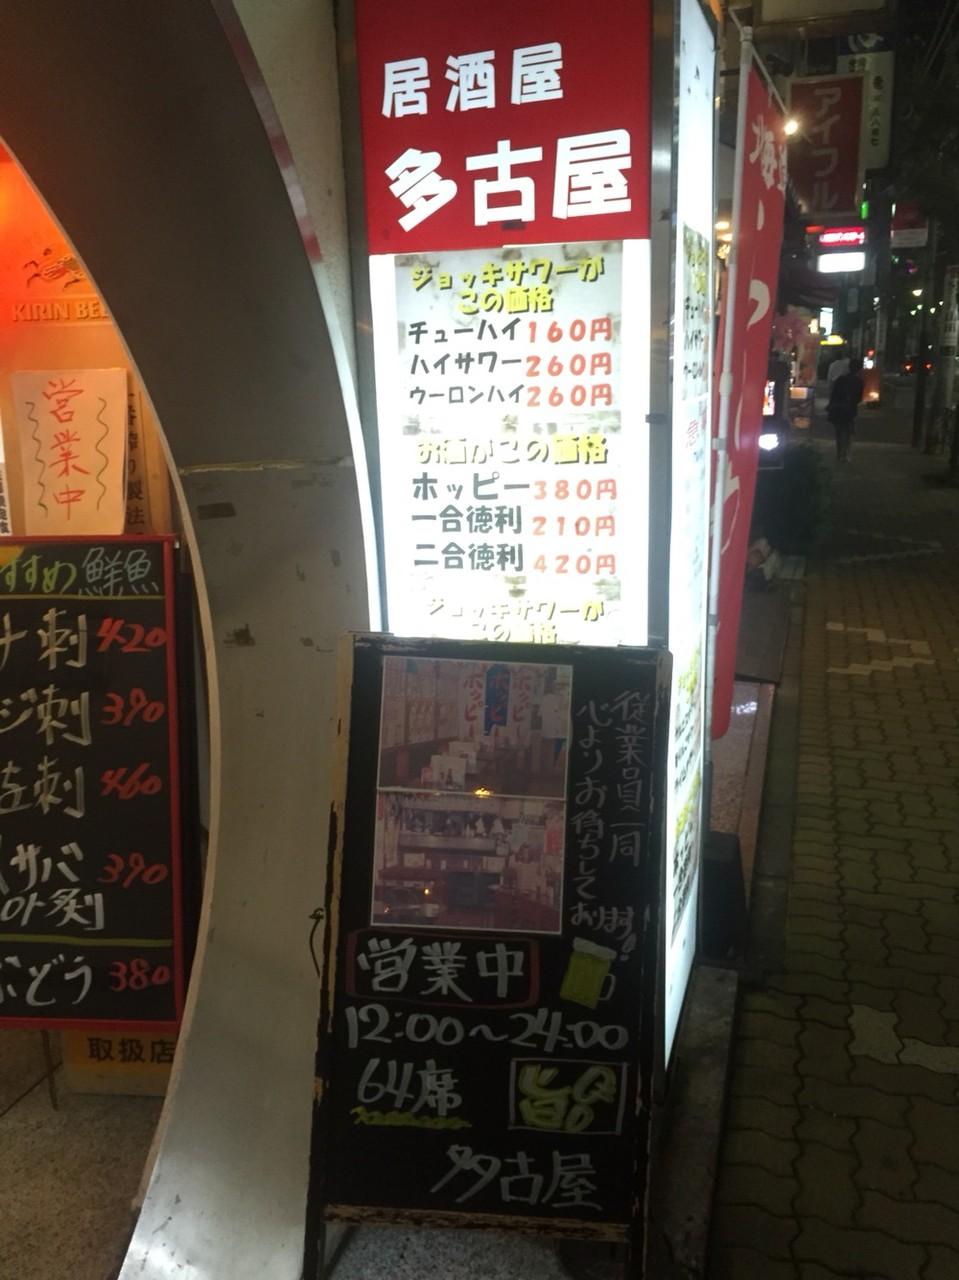 Entrance of Takoya Izakaya restaurant Tokyo Kokubunji